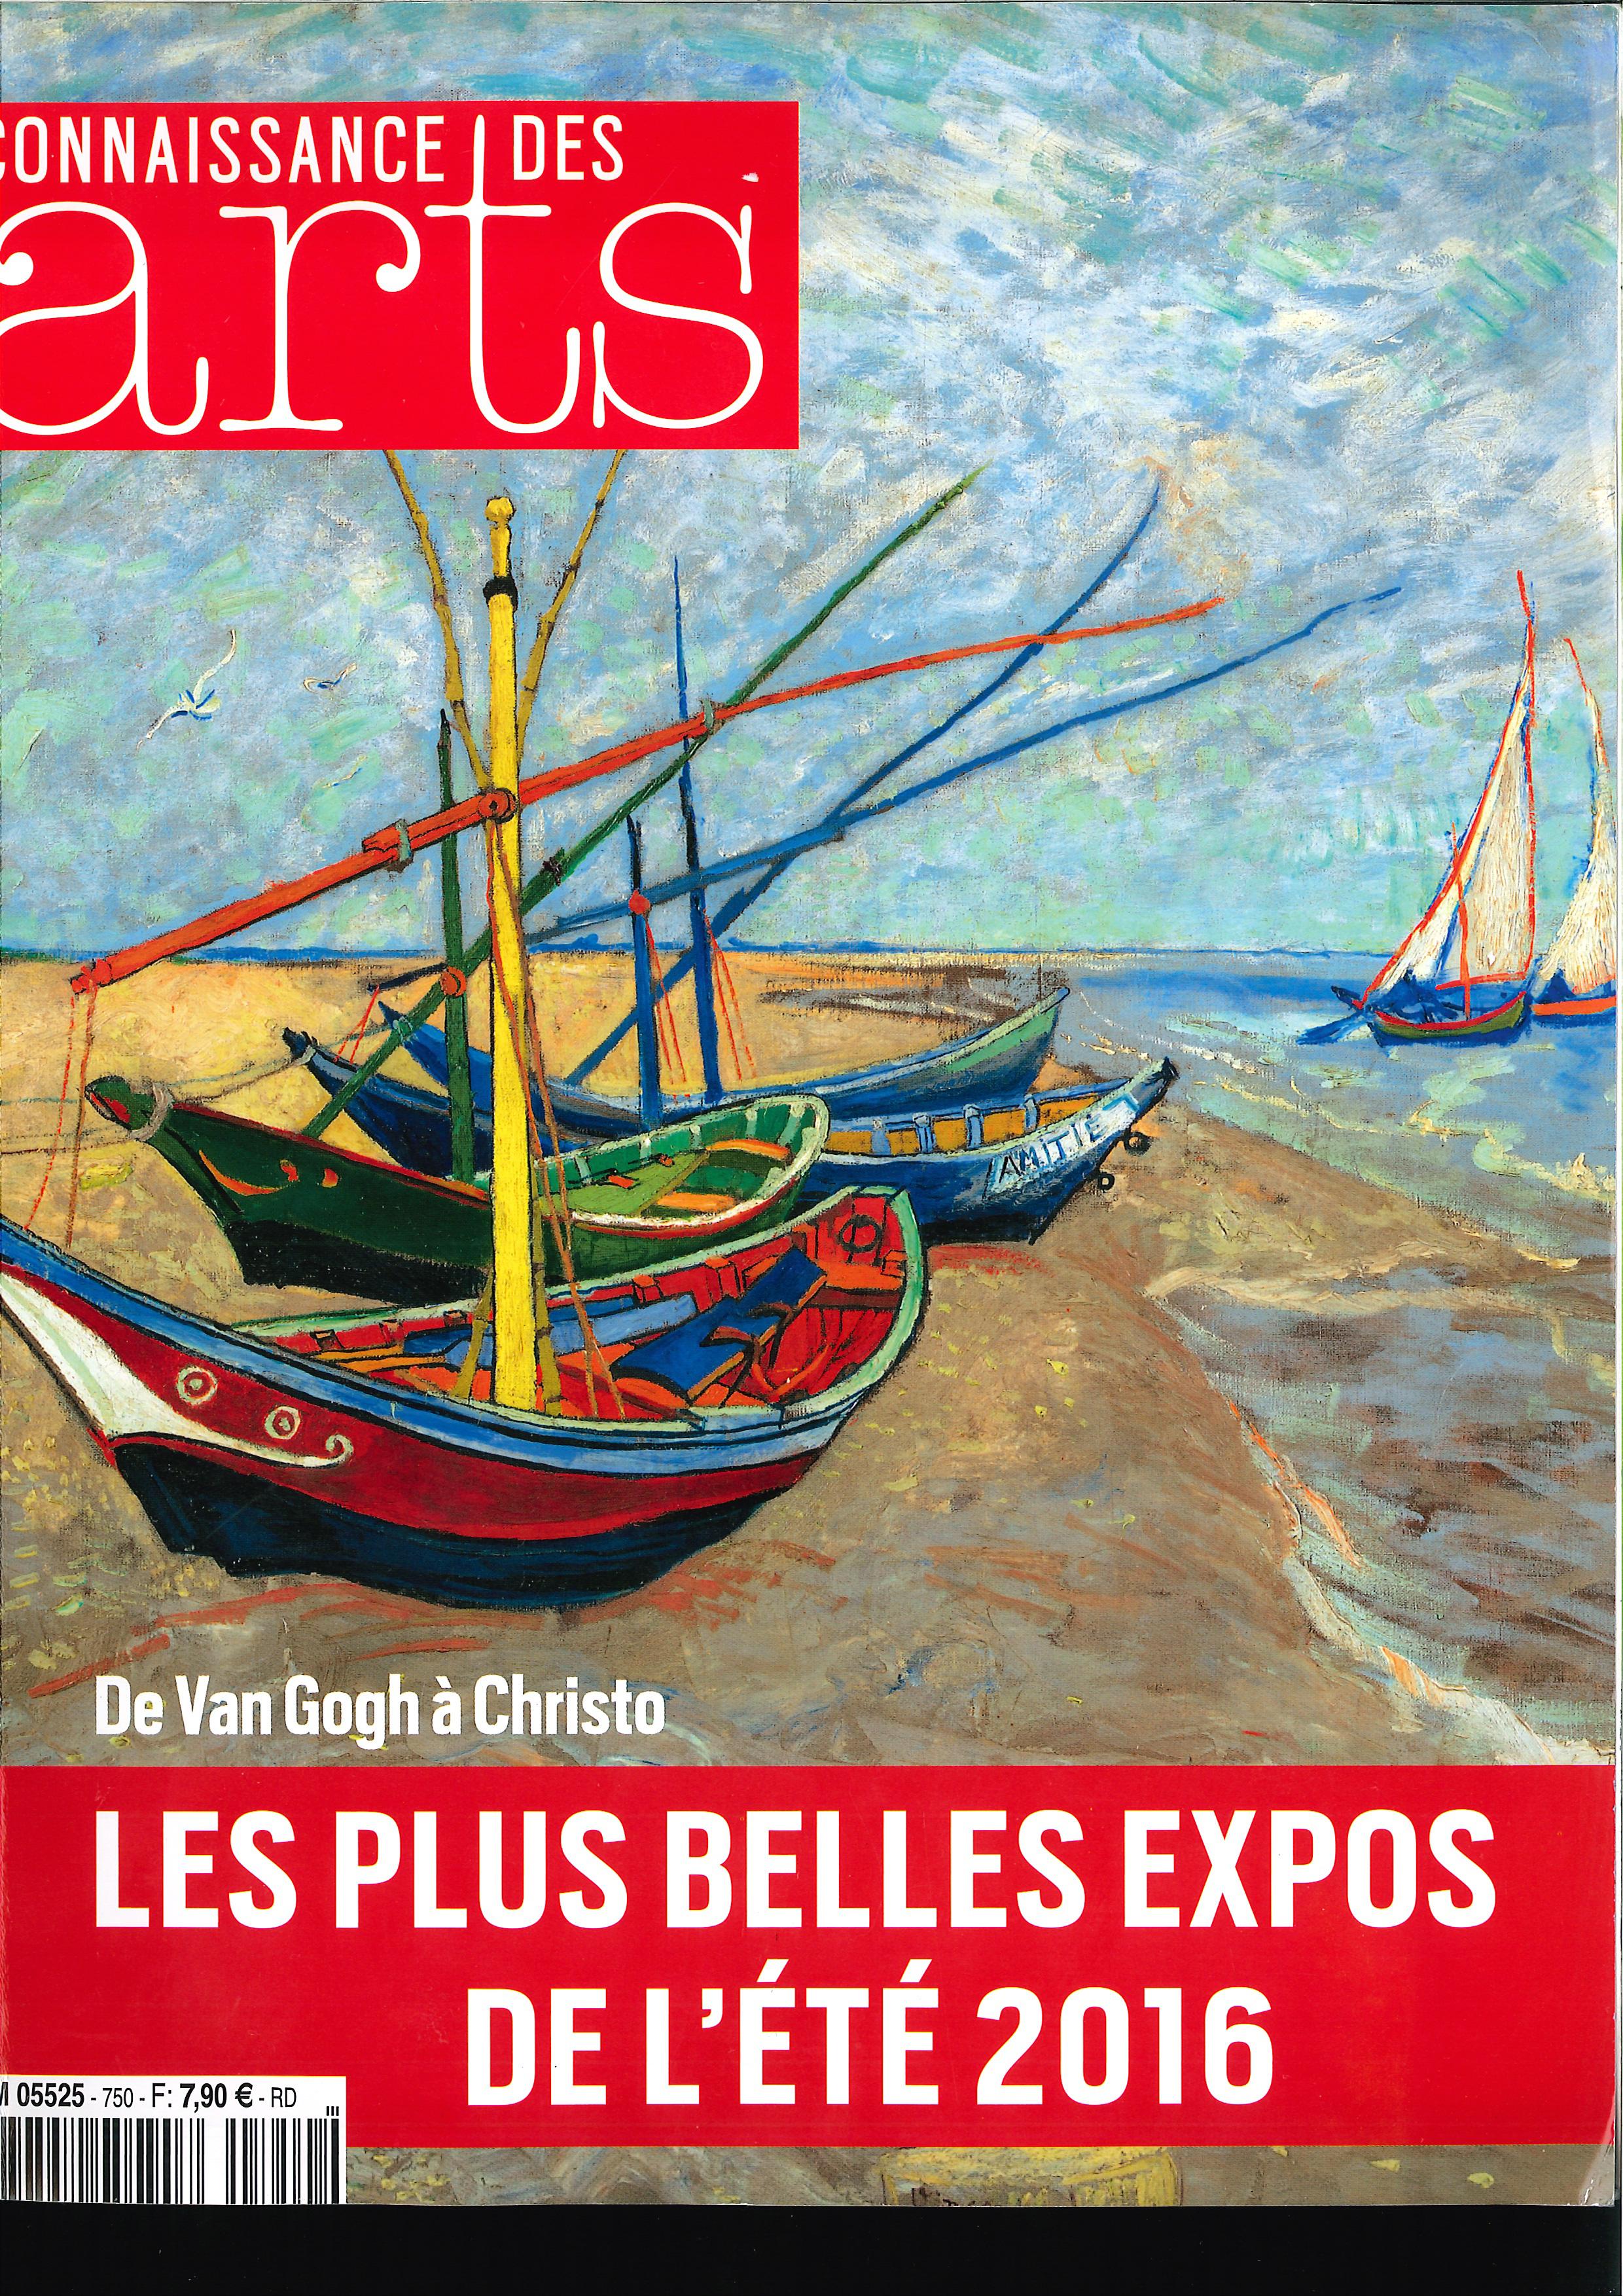 Connaisance-des-arts-Alinka_echeverria-cover.jpg